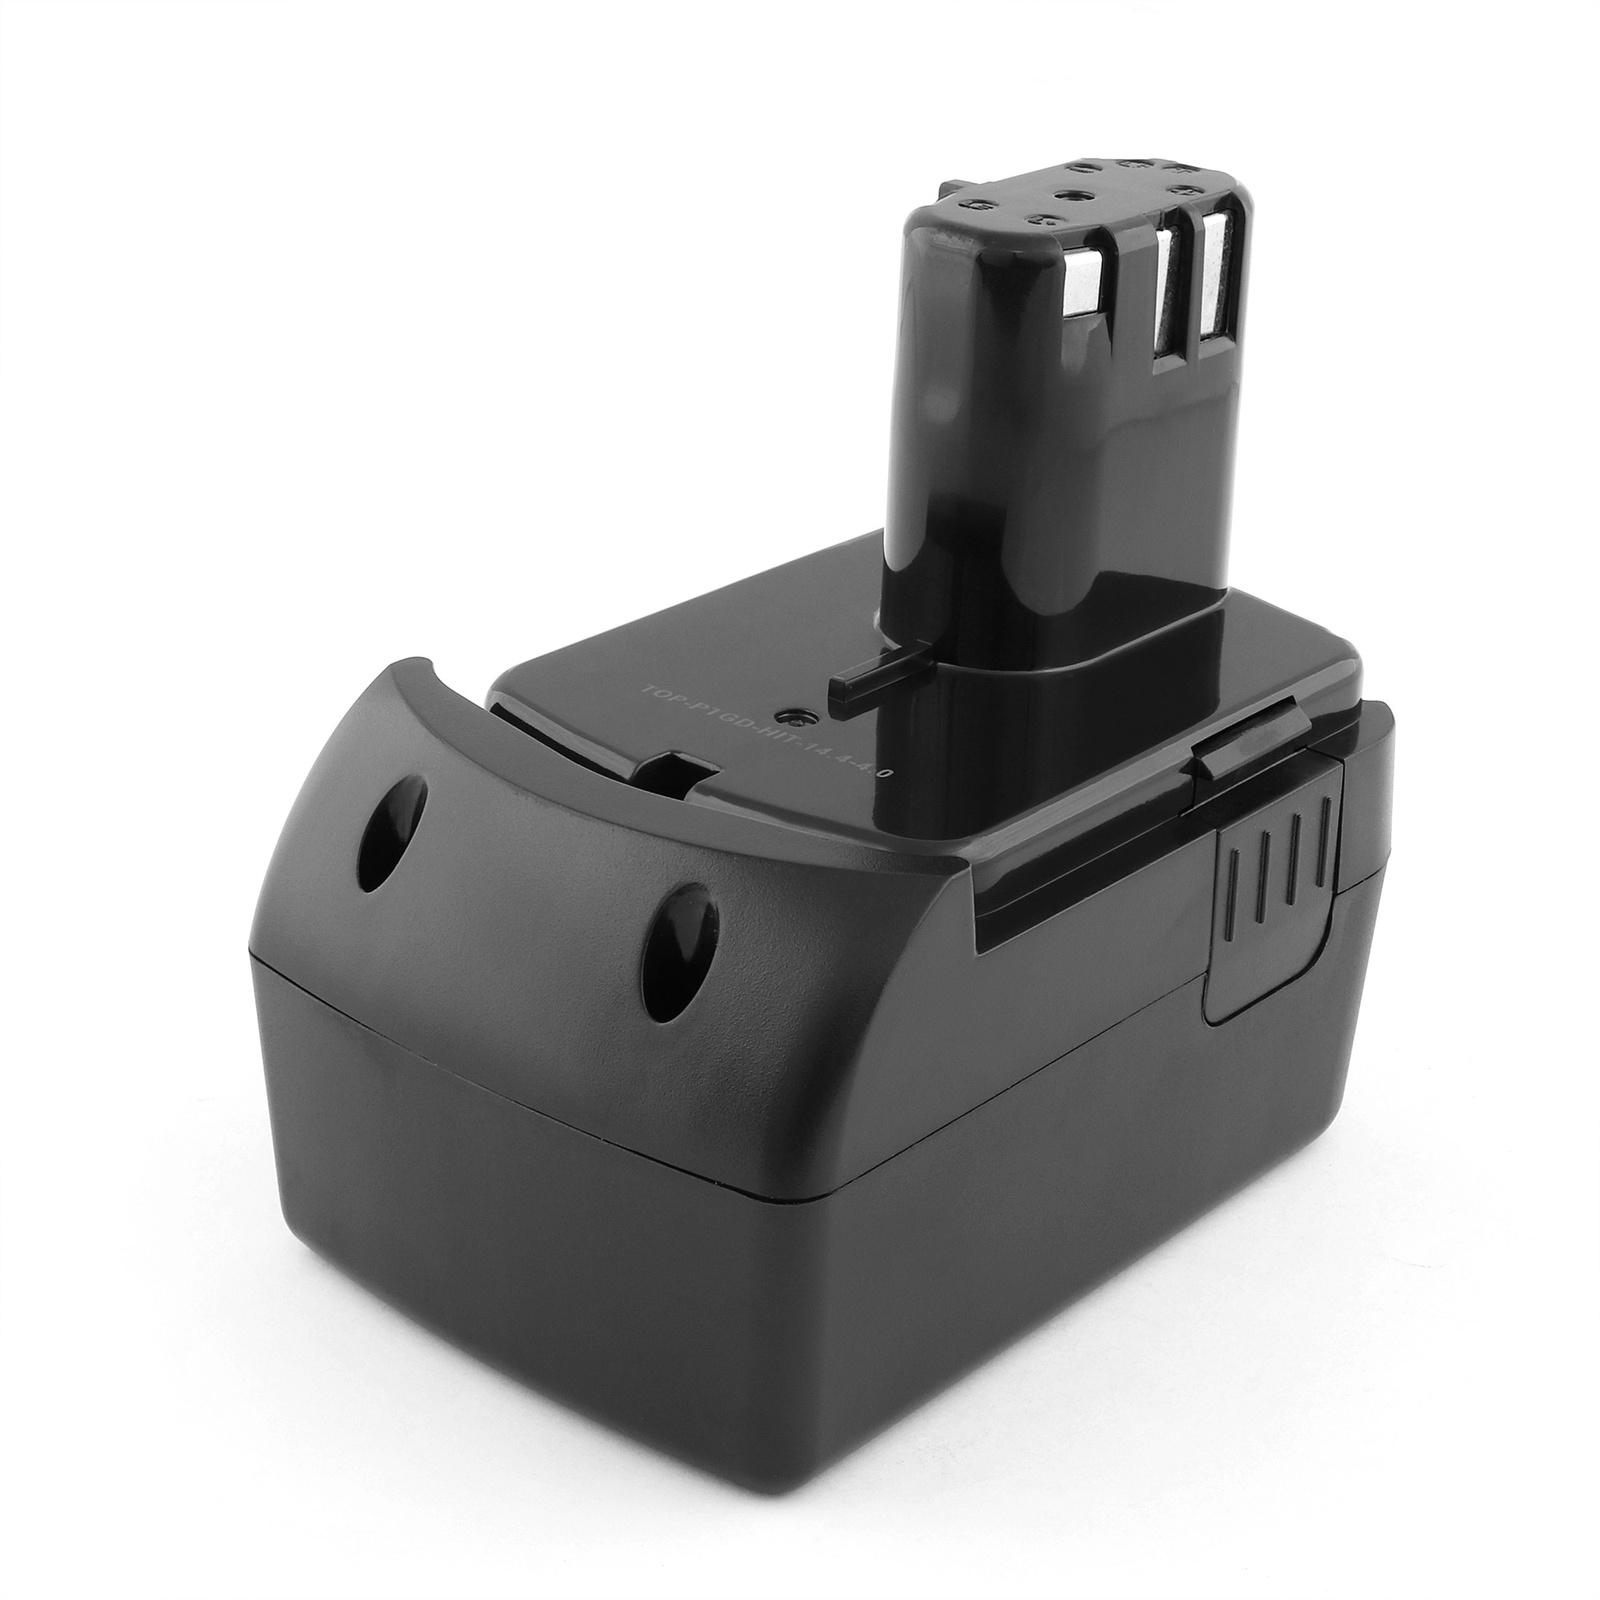 Аккумулятор для Hitachi 14.4V 4.0Ah (Li-Ion) PN: BCL 1415, BCL 1430, EBL 1430.